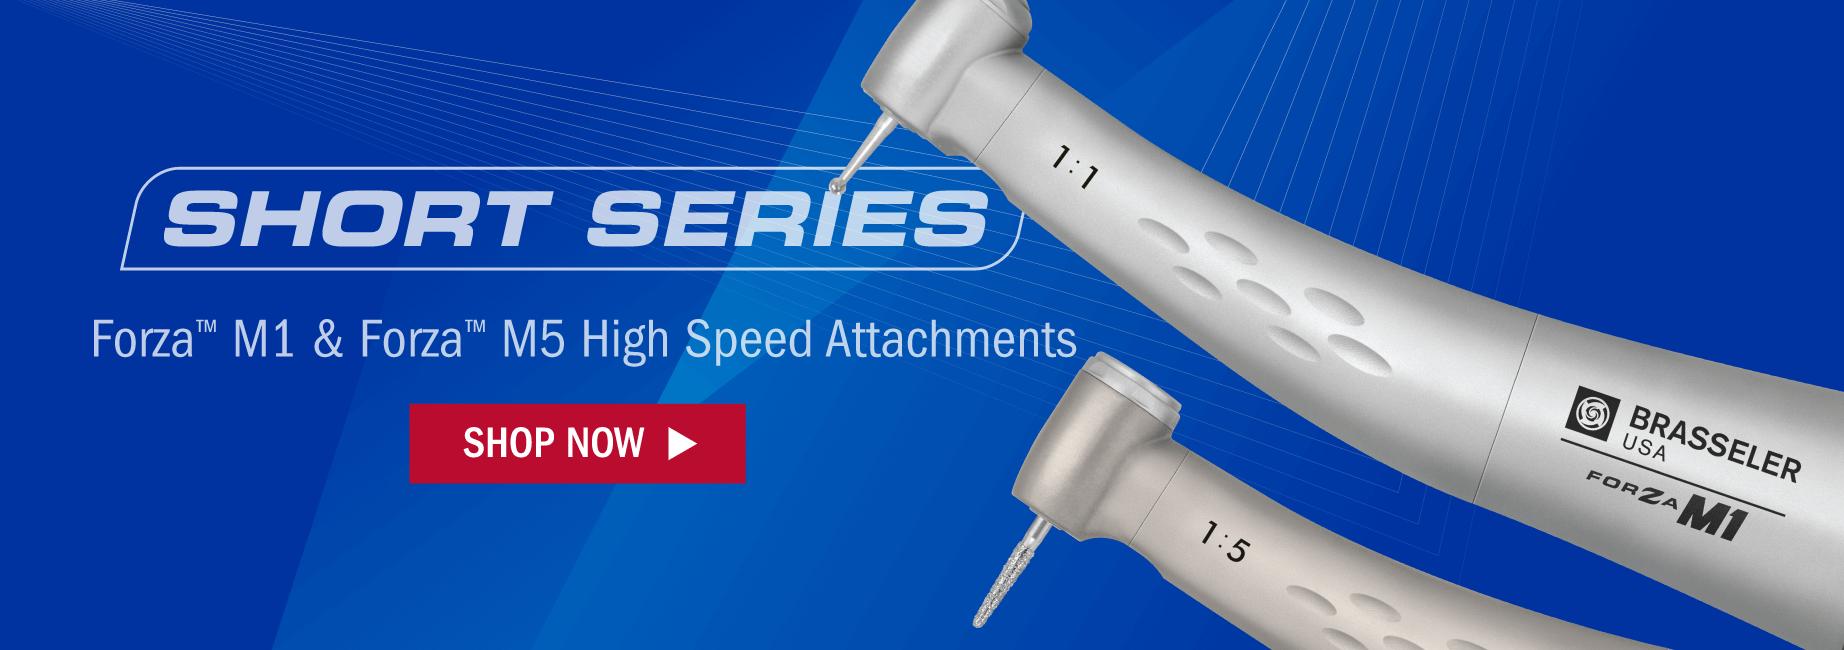 FORZA Short Series Attachments. Brasseler's Next Generation Electric.